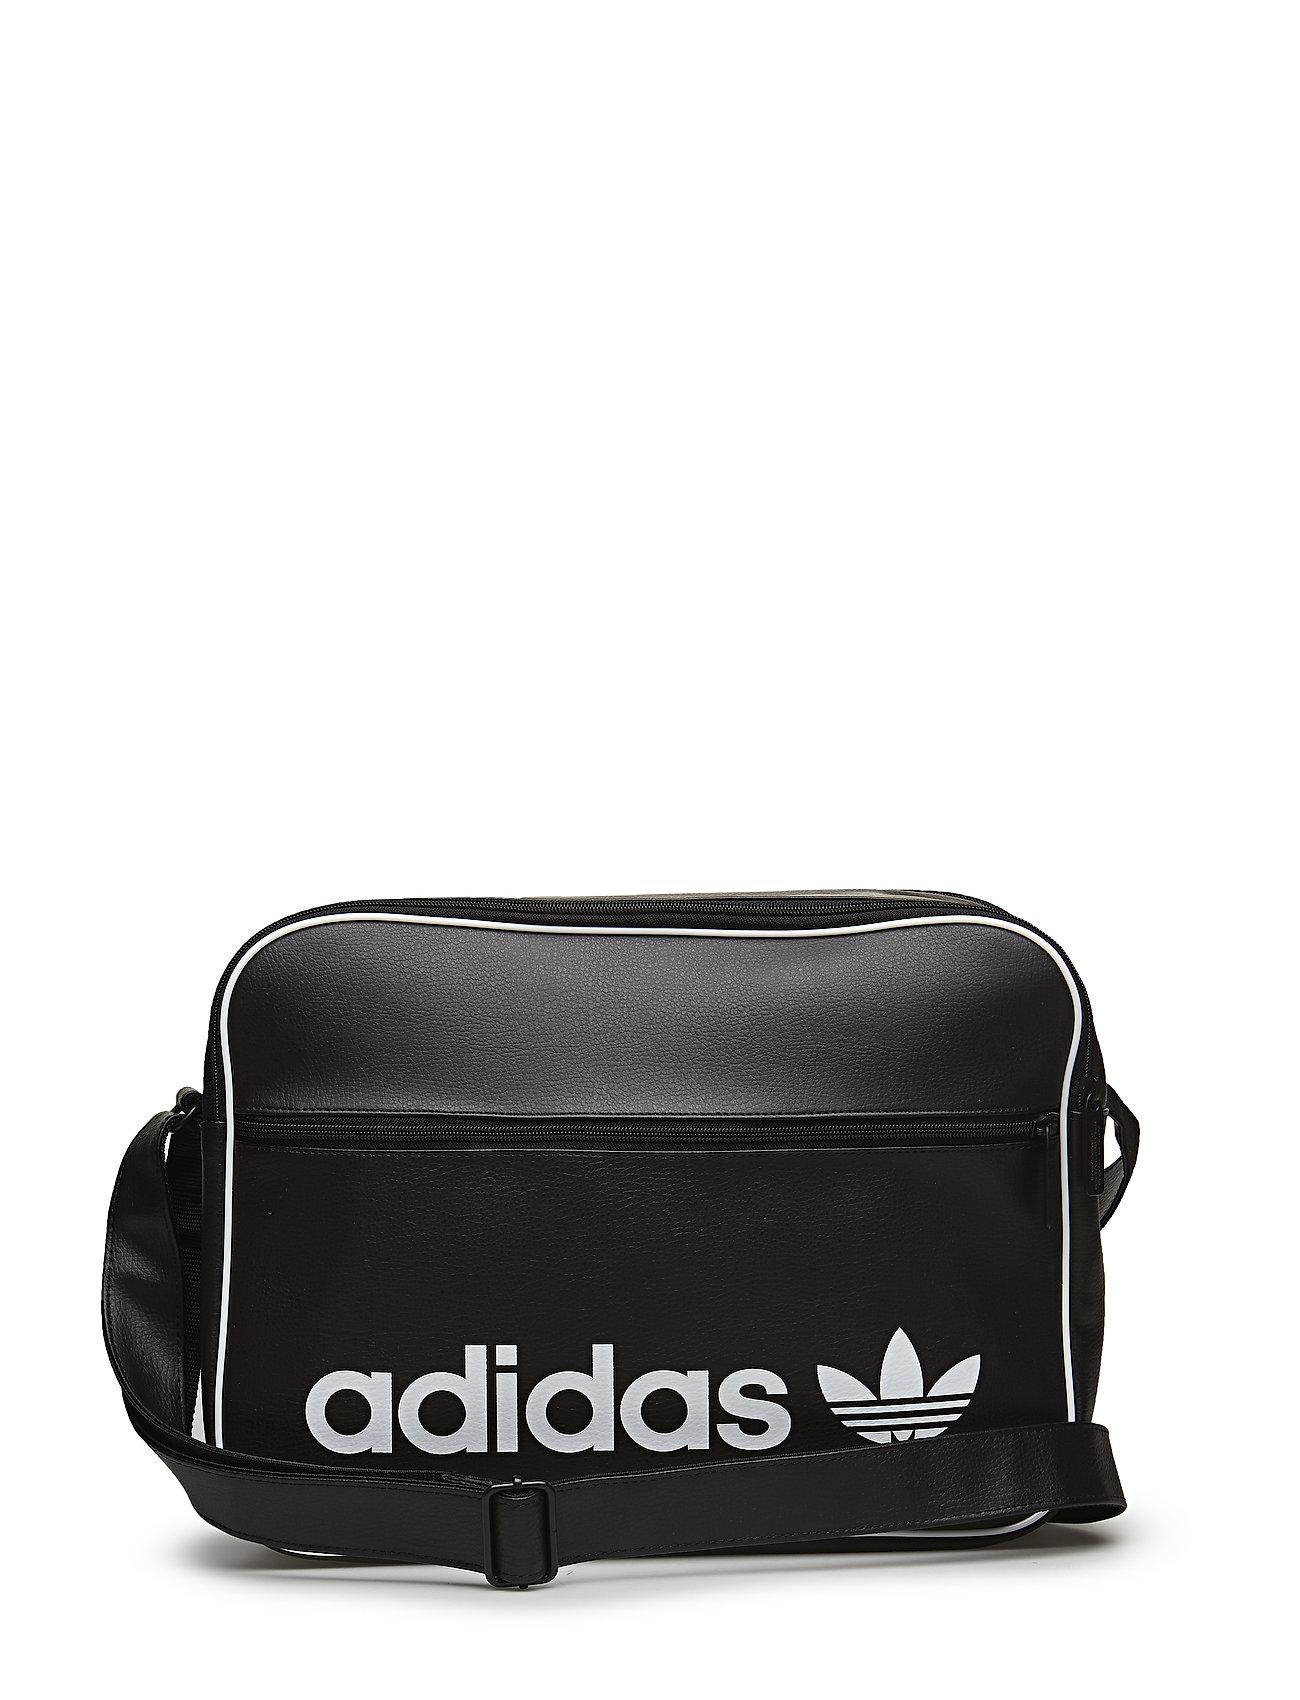 adidas Originals AIRLINER VINT - BLACK